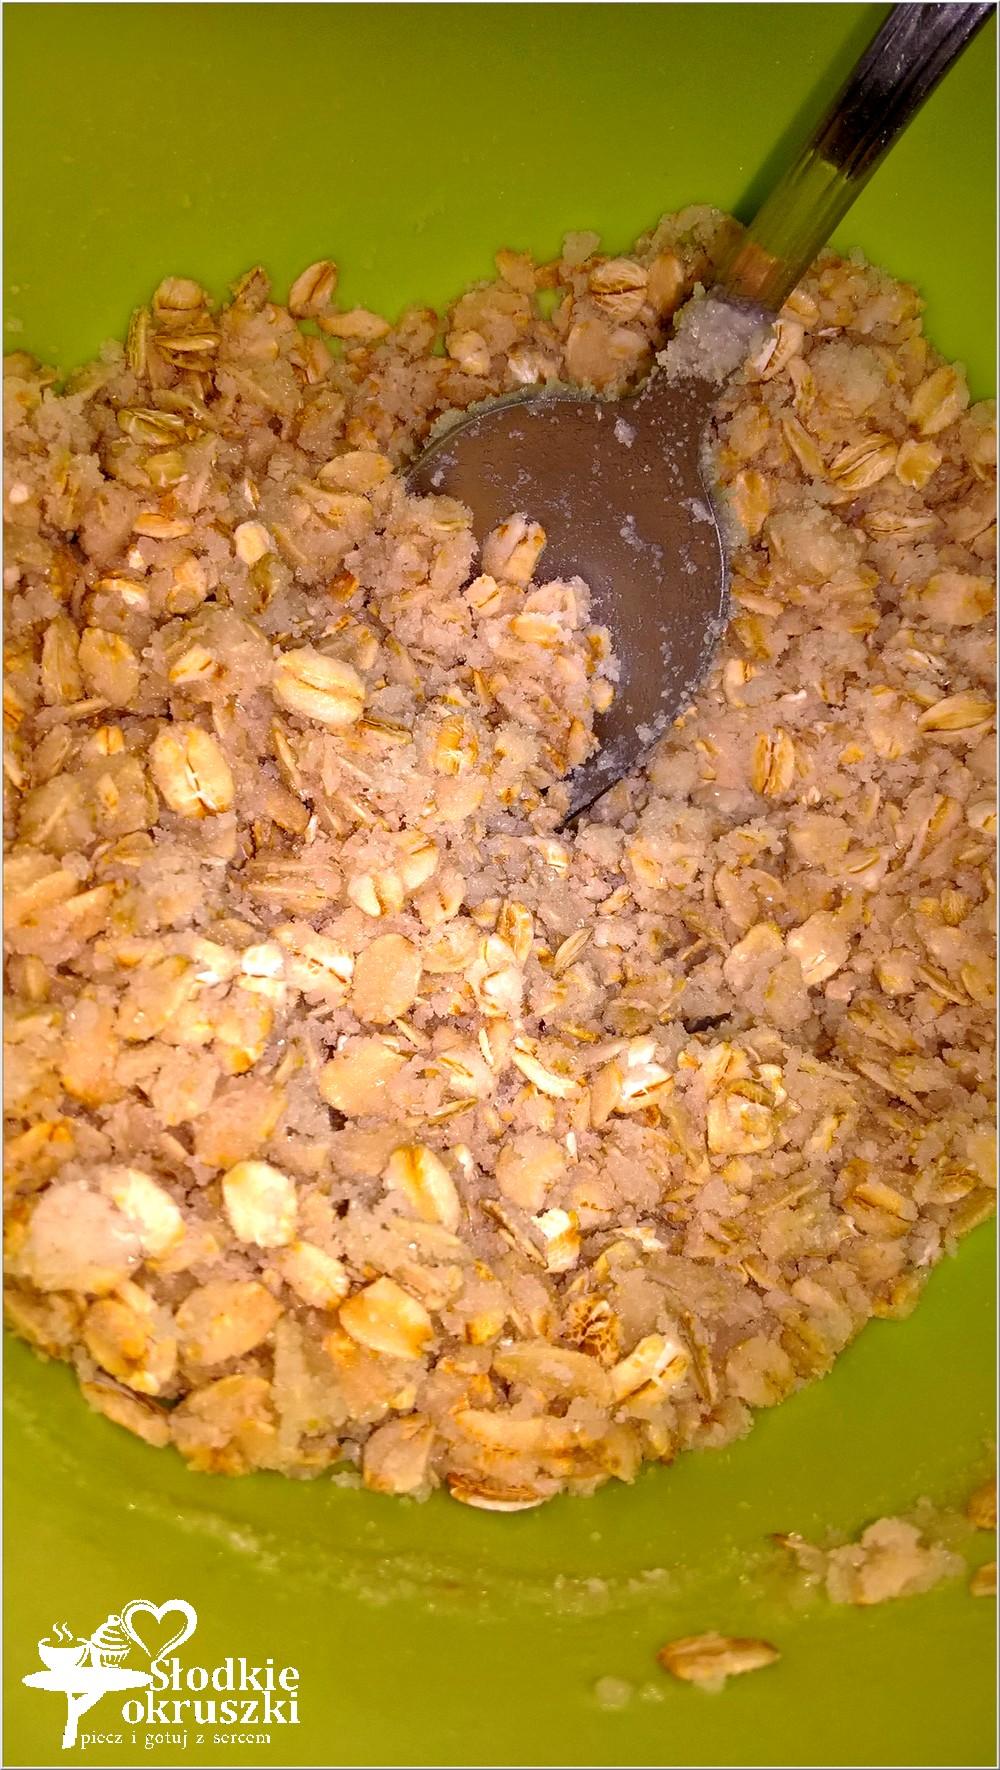 zdrowa-kokosowa-kruszonka